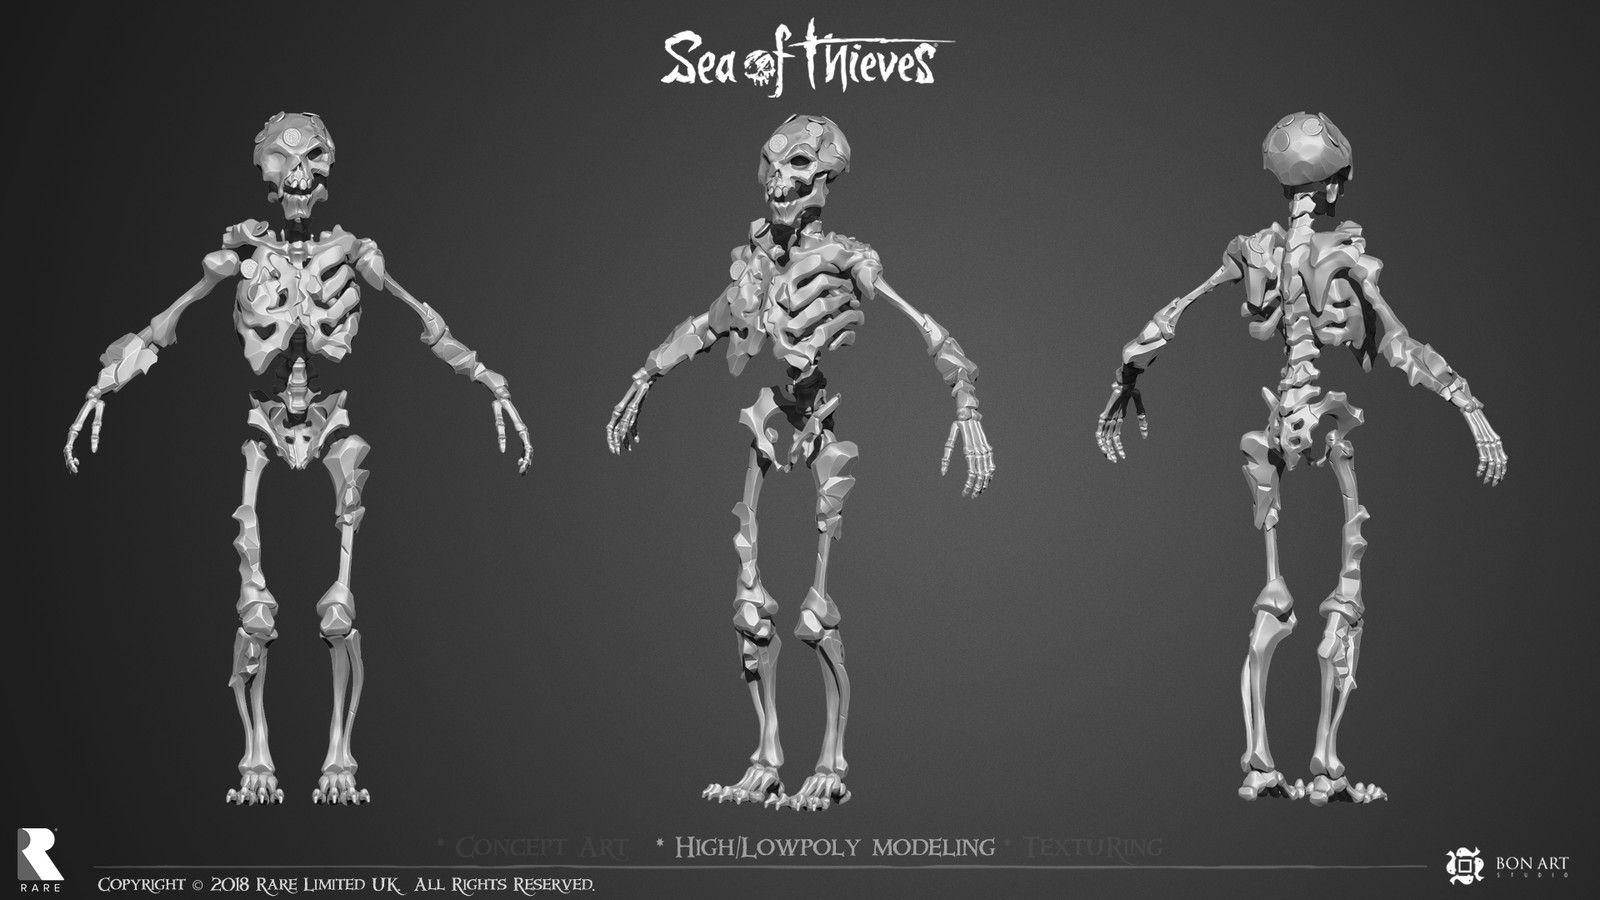 Sea Of Thieves Metal Skeleton 01 Ivan Yosifov On Artstation At Https Www Artstation Com Artwork Odgkw Sea Of Thieves Thief Sea